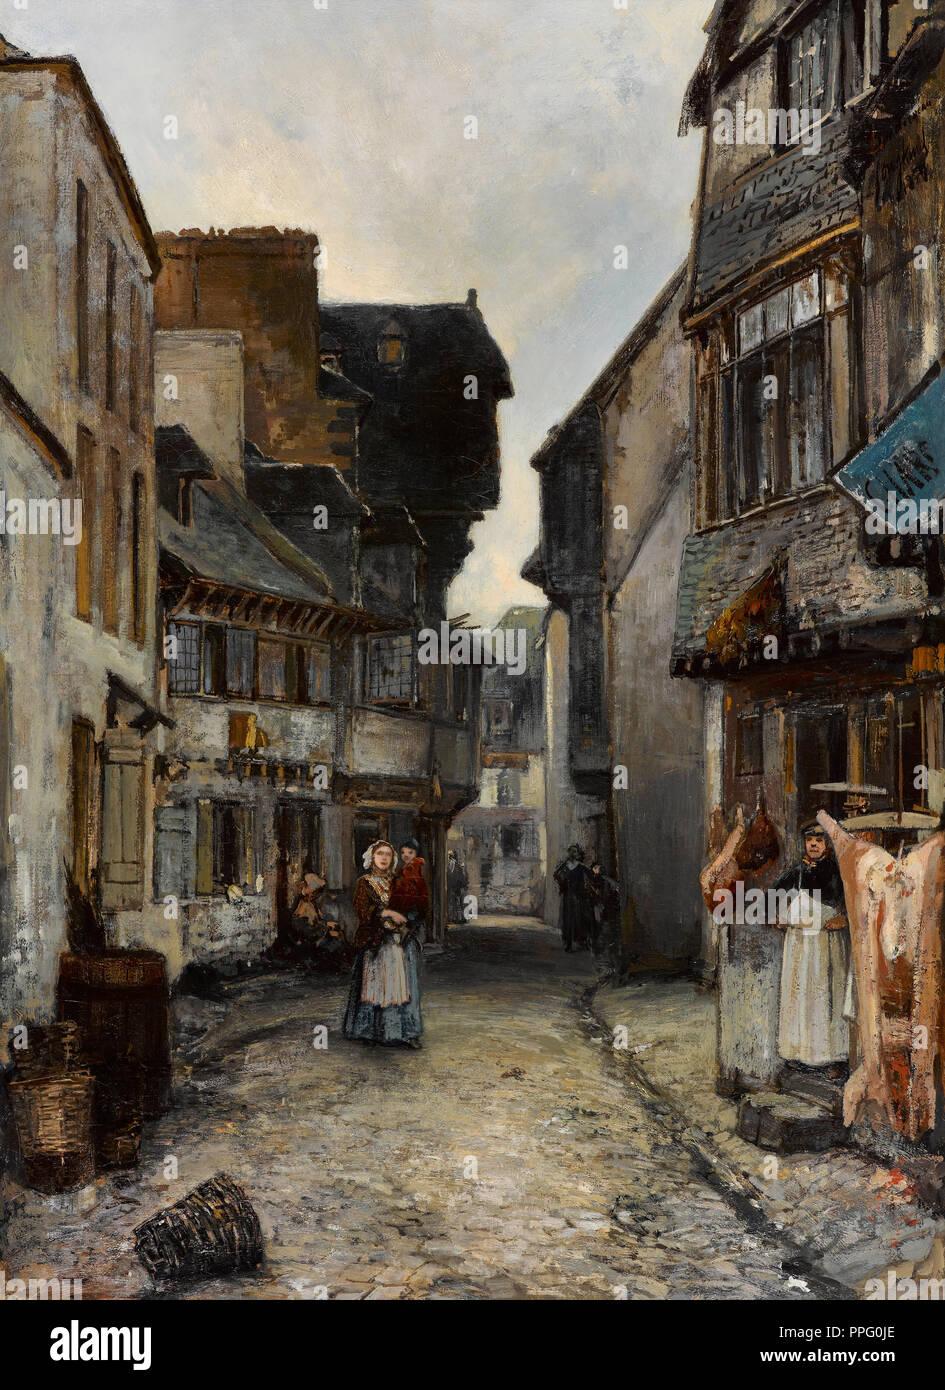 Johan Jongkind - una strada di Landerneau 1851 olio su tela. Gemeentemuseum Den Haag (L'Aia), l'Aia, Paesi Bassi. Immagini Stock